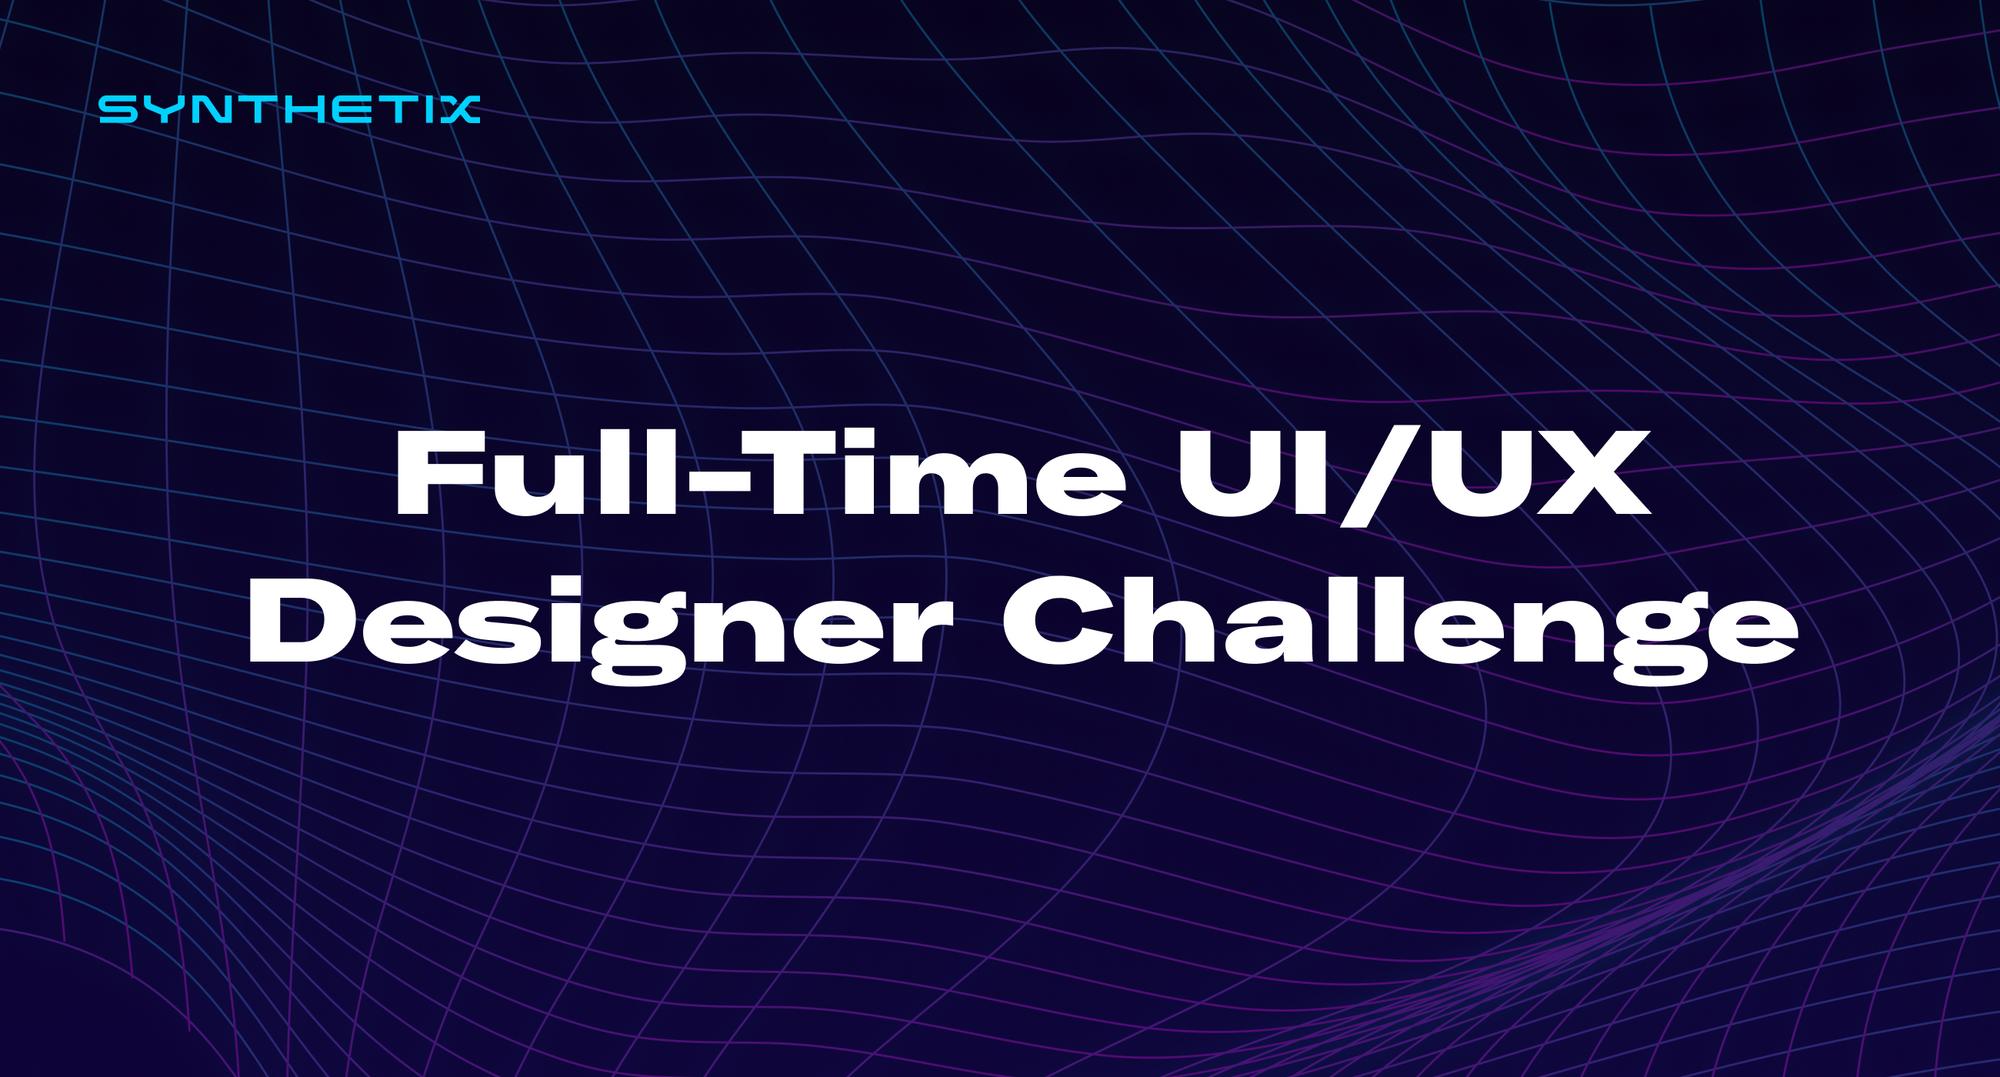 Full-Time UI/UX Designer Challenge